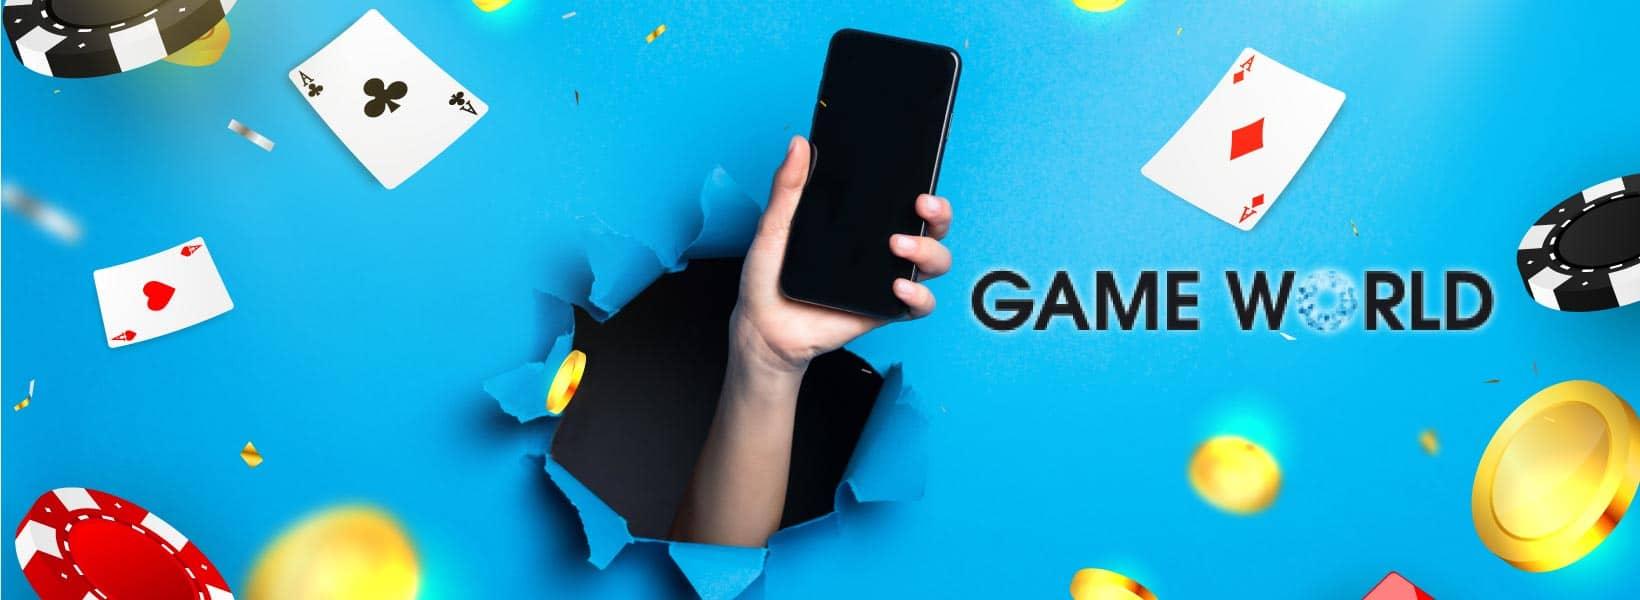 game world mobile